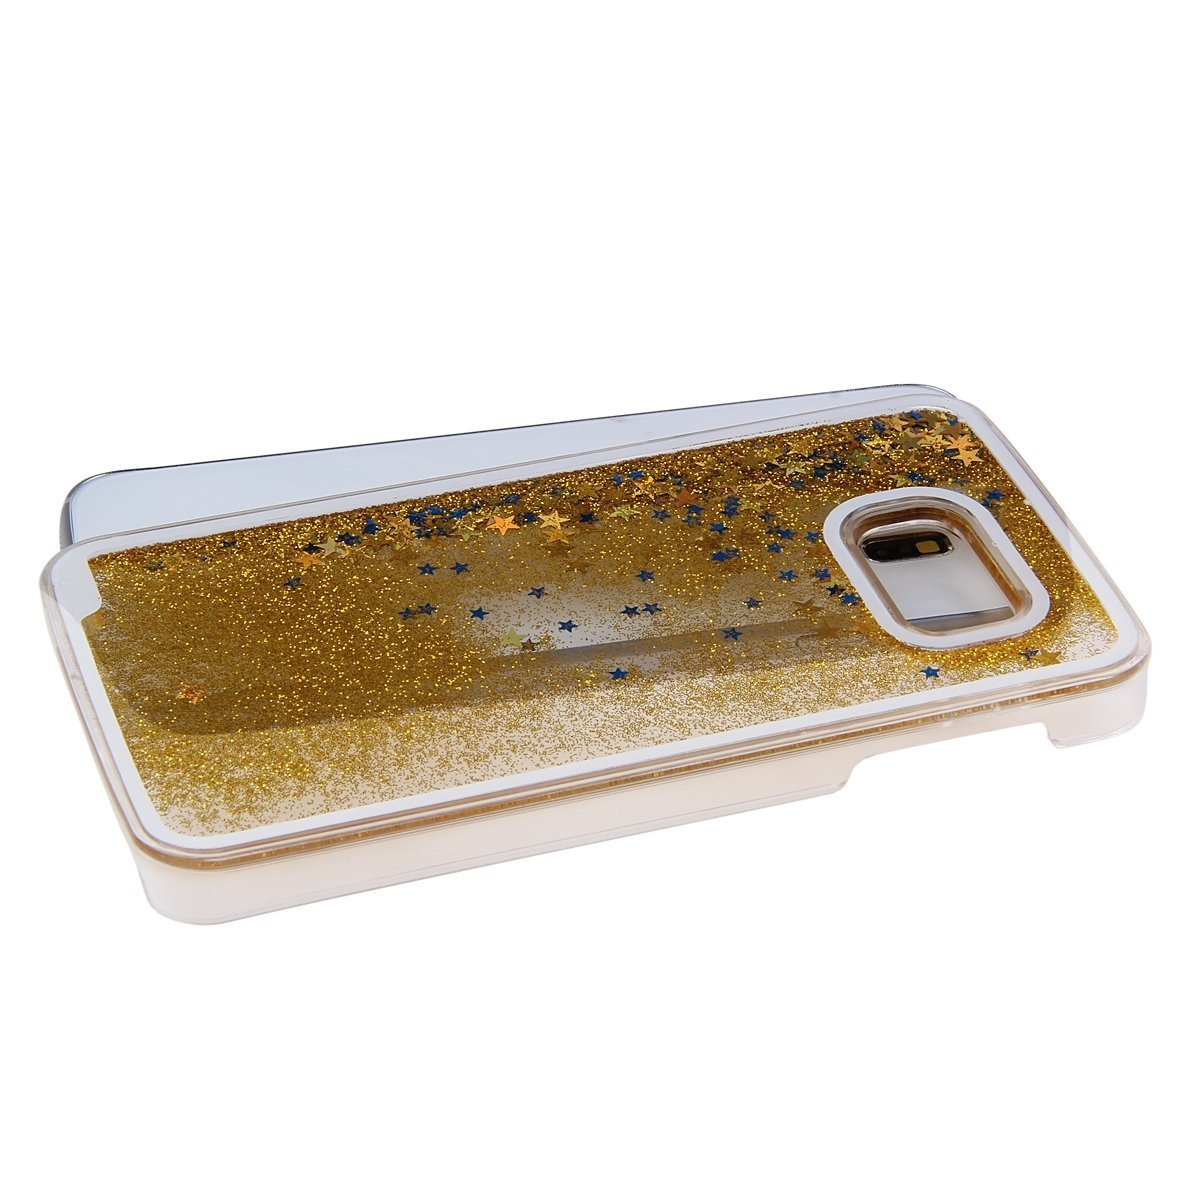 Amazon.com: Galaxy S6 Funda, liujie Cute Funny Glitter ...